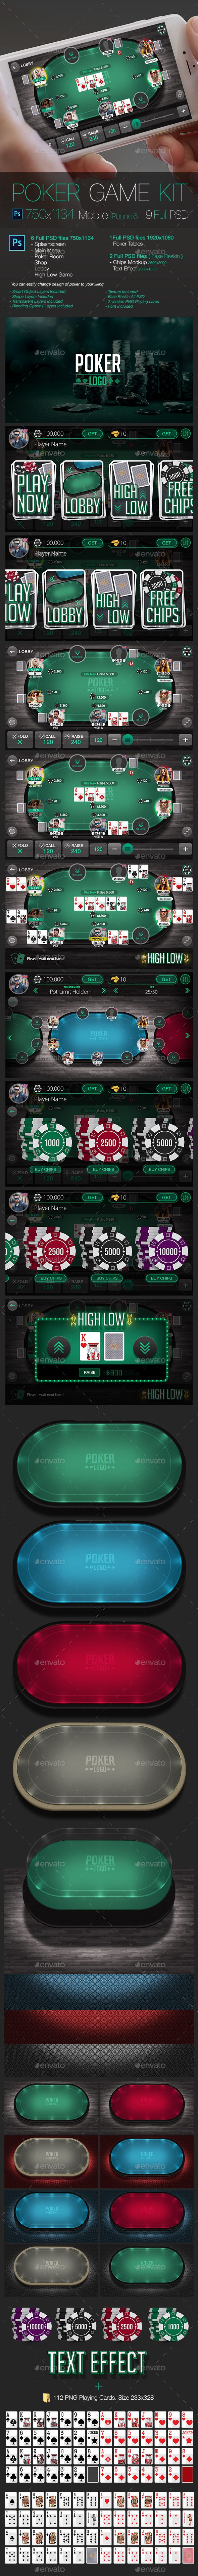 Poker Game Kit - Game Kits #Game Assets Download here:  https://graphicriver.net/item/poker-game-kit/19551675?ref=alena994